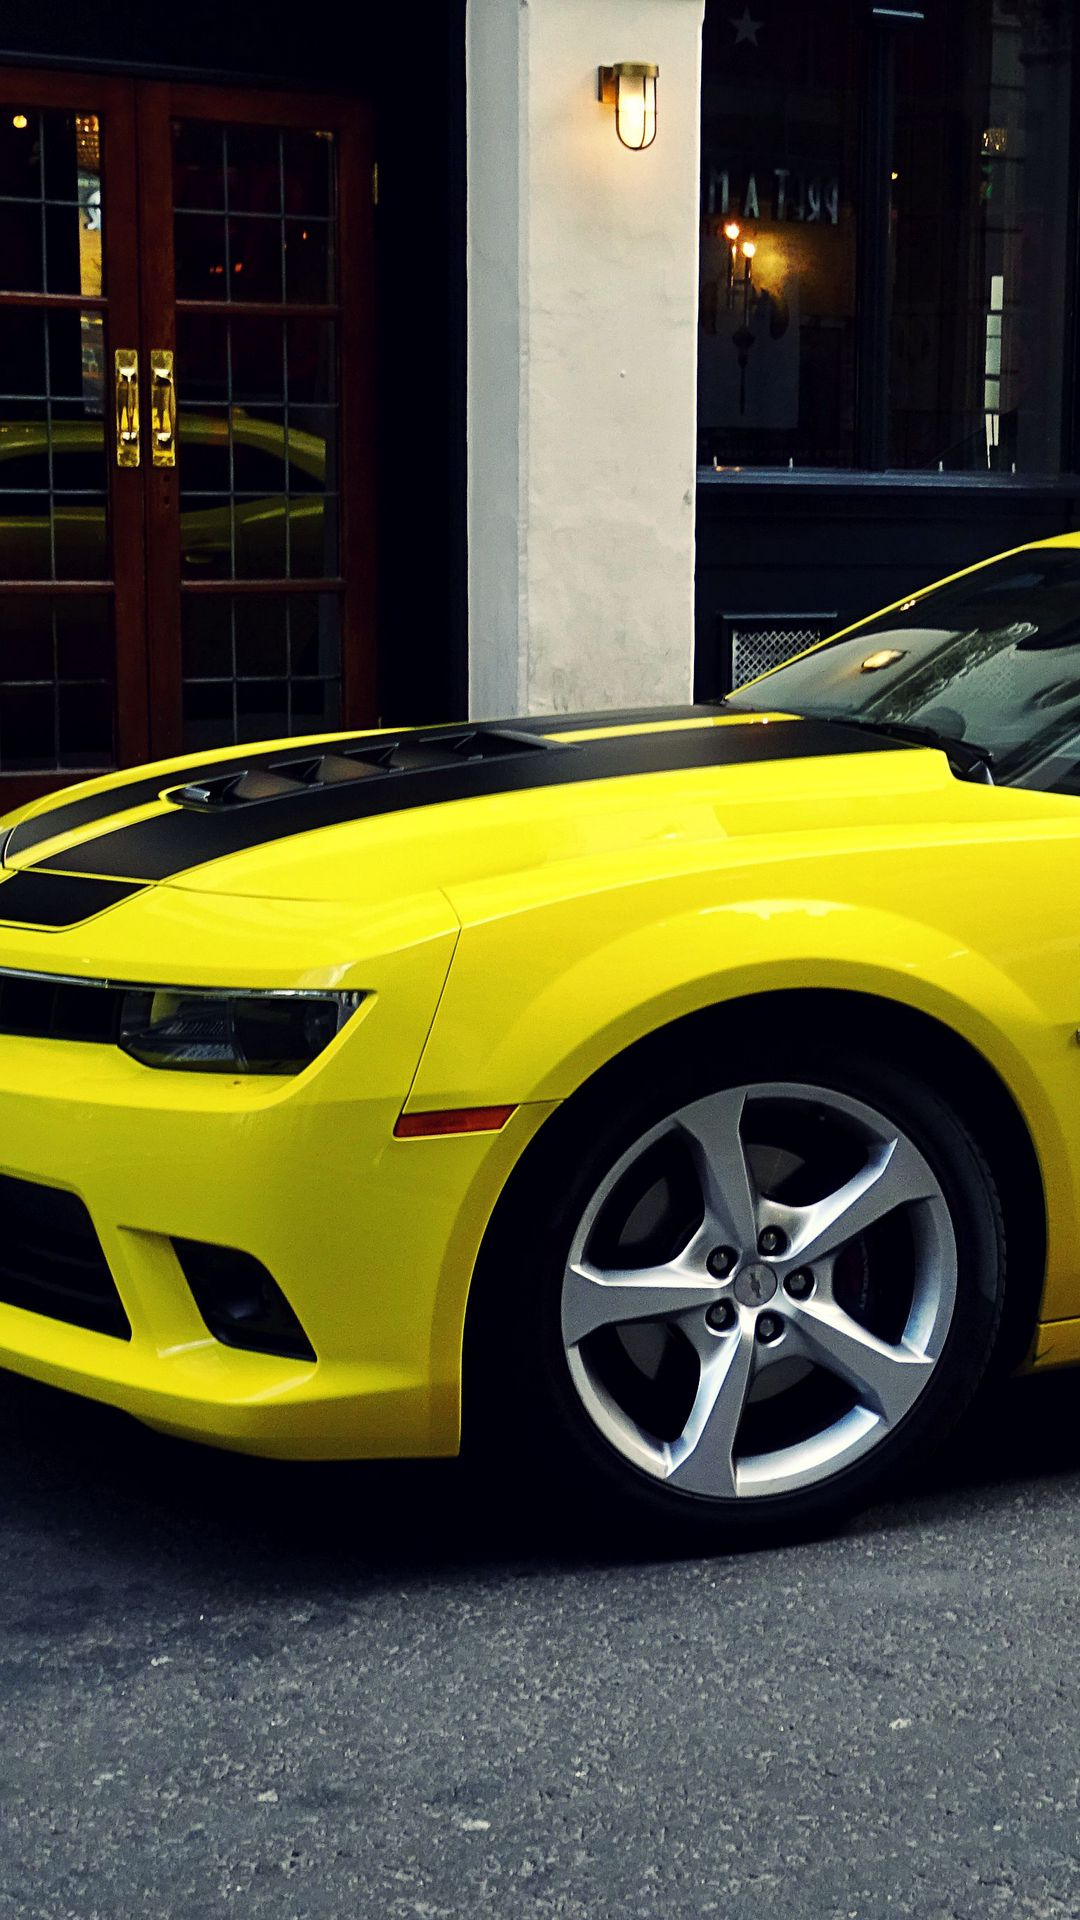 JDM American Modified Car Wallpapers